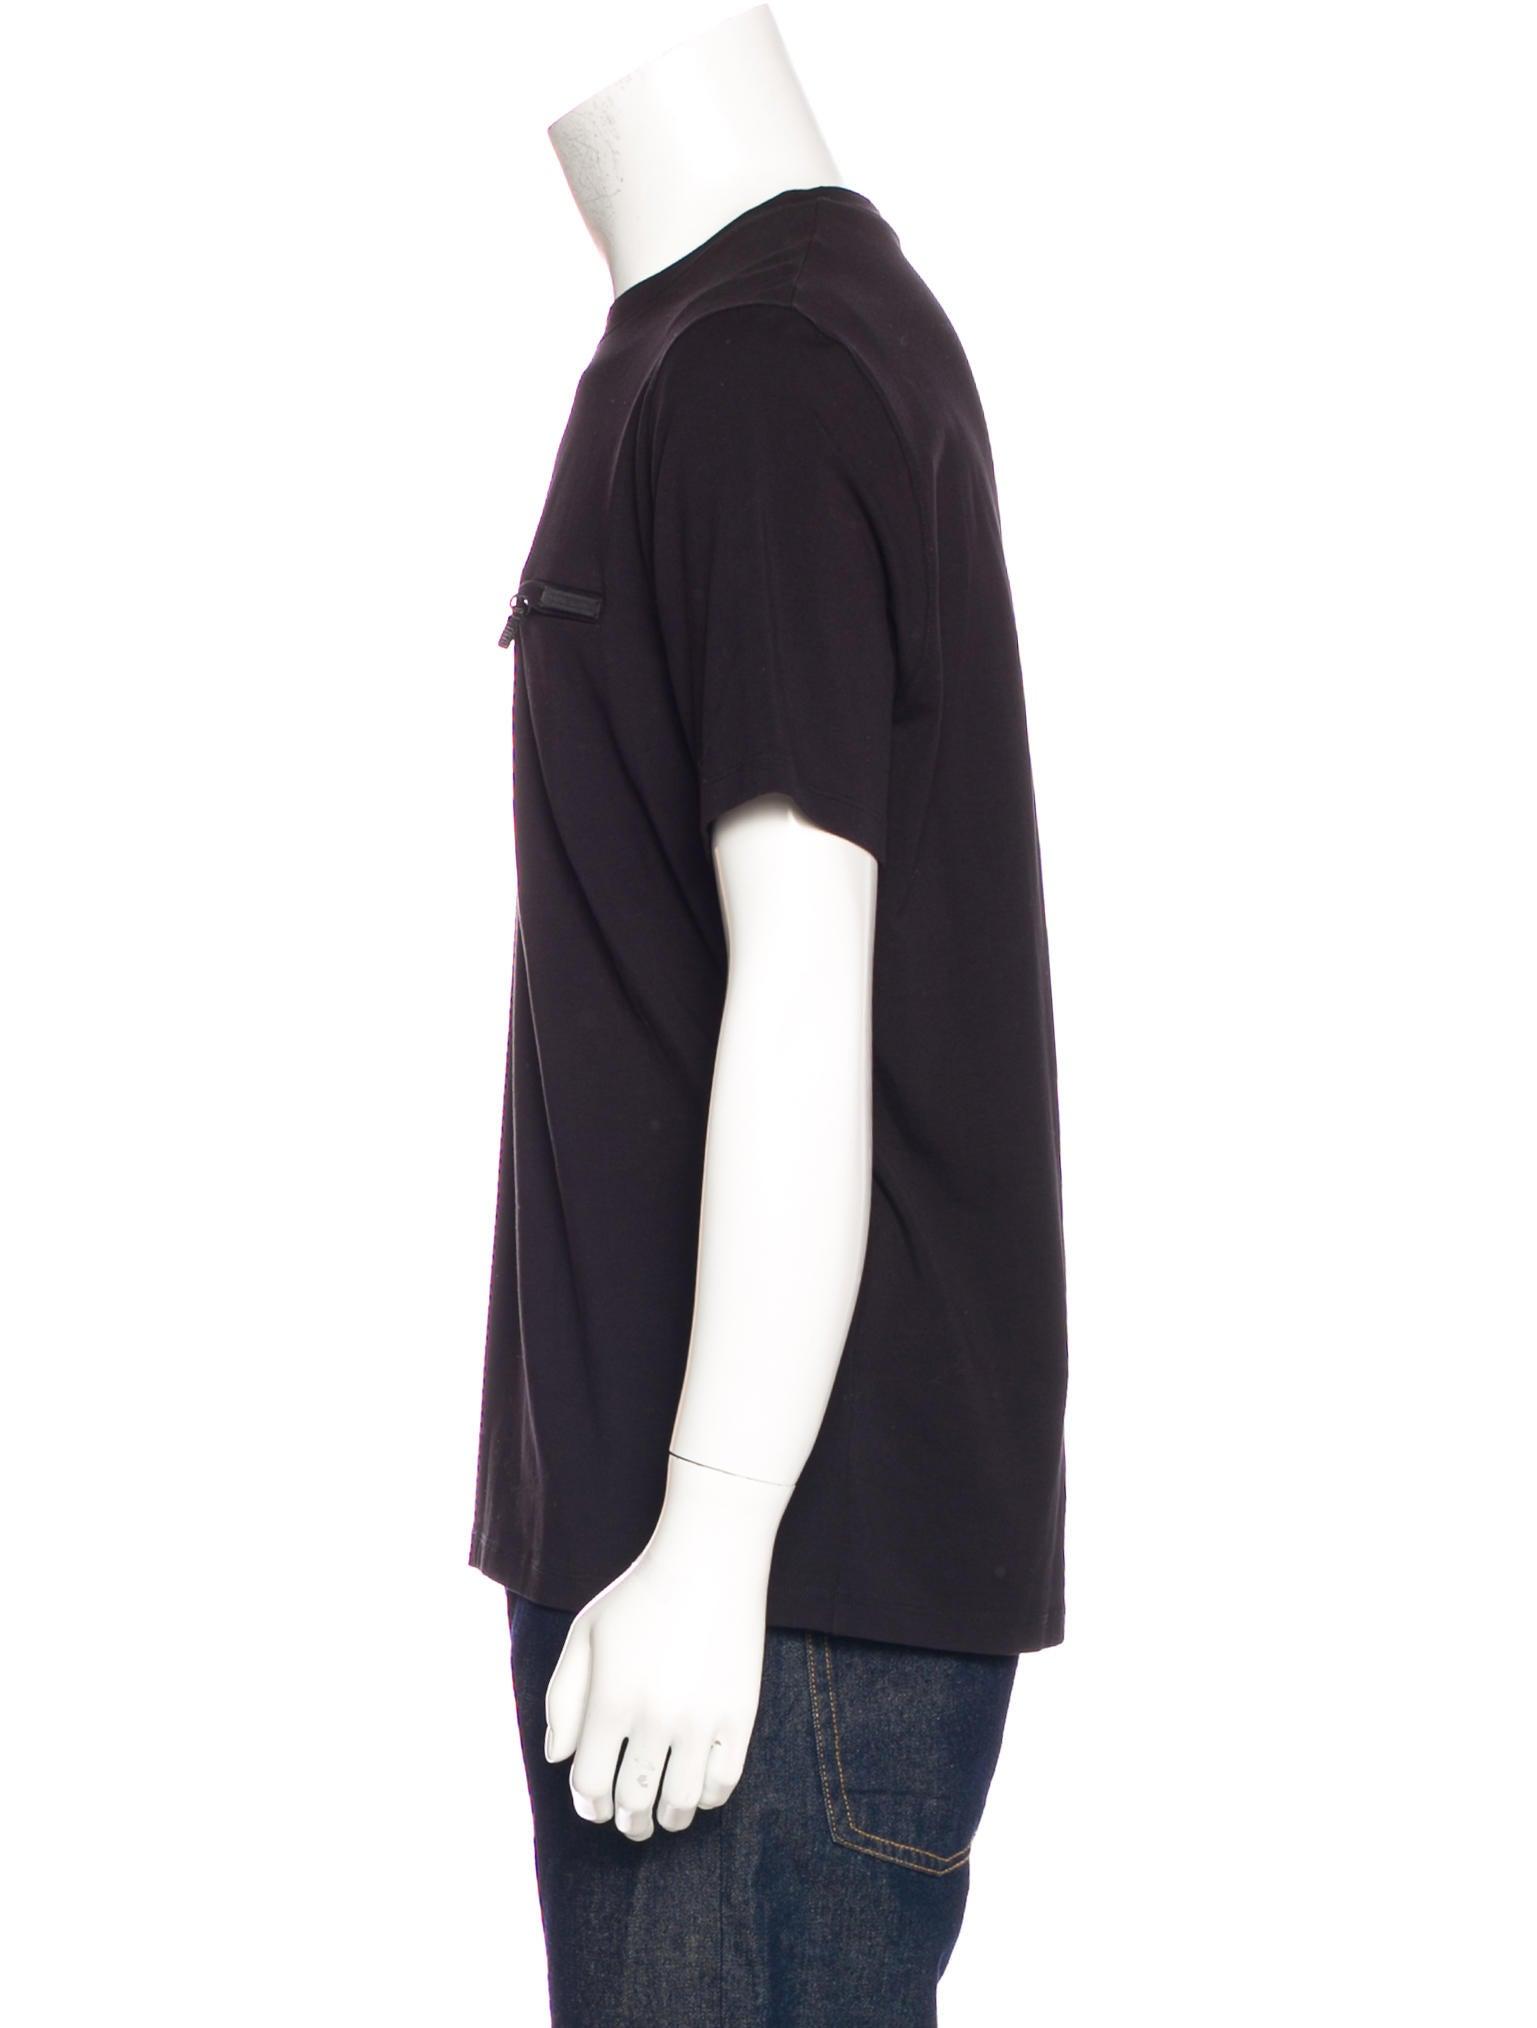 Prada zipper pocket t shirt clothing pra168623 the for Travel shirts with zipper pockets